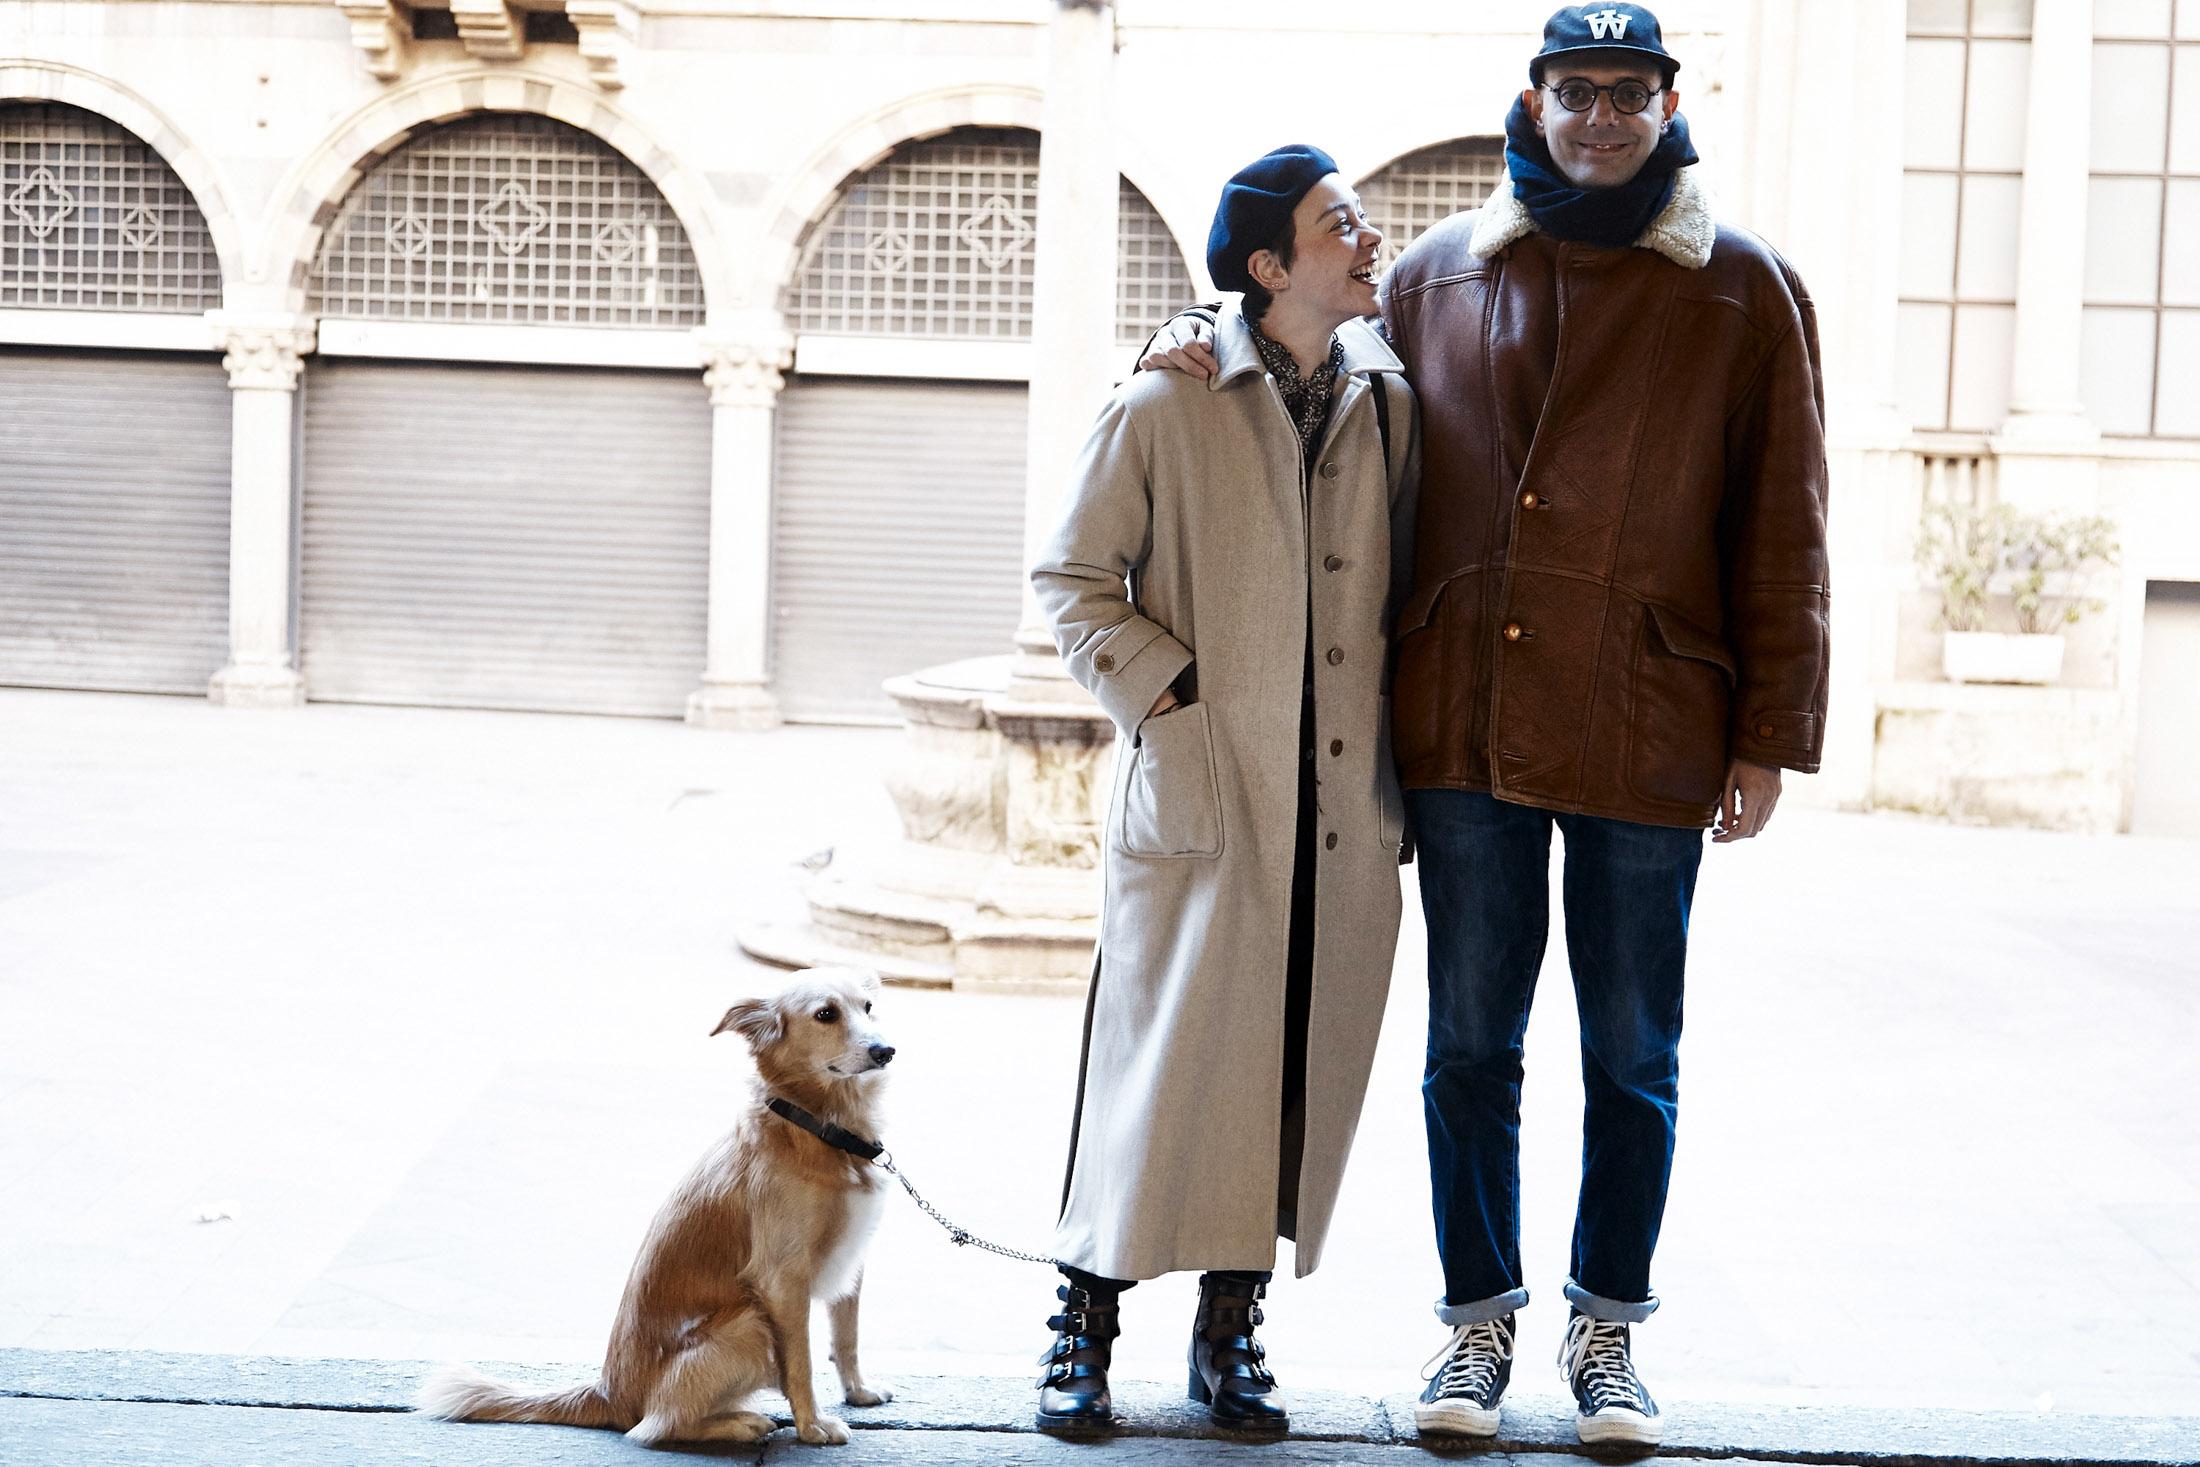 Francesca and Andrea + Aldo, the Mixed Breed